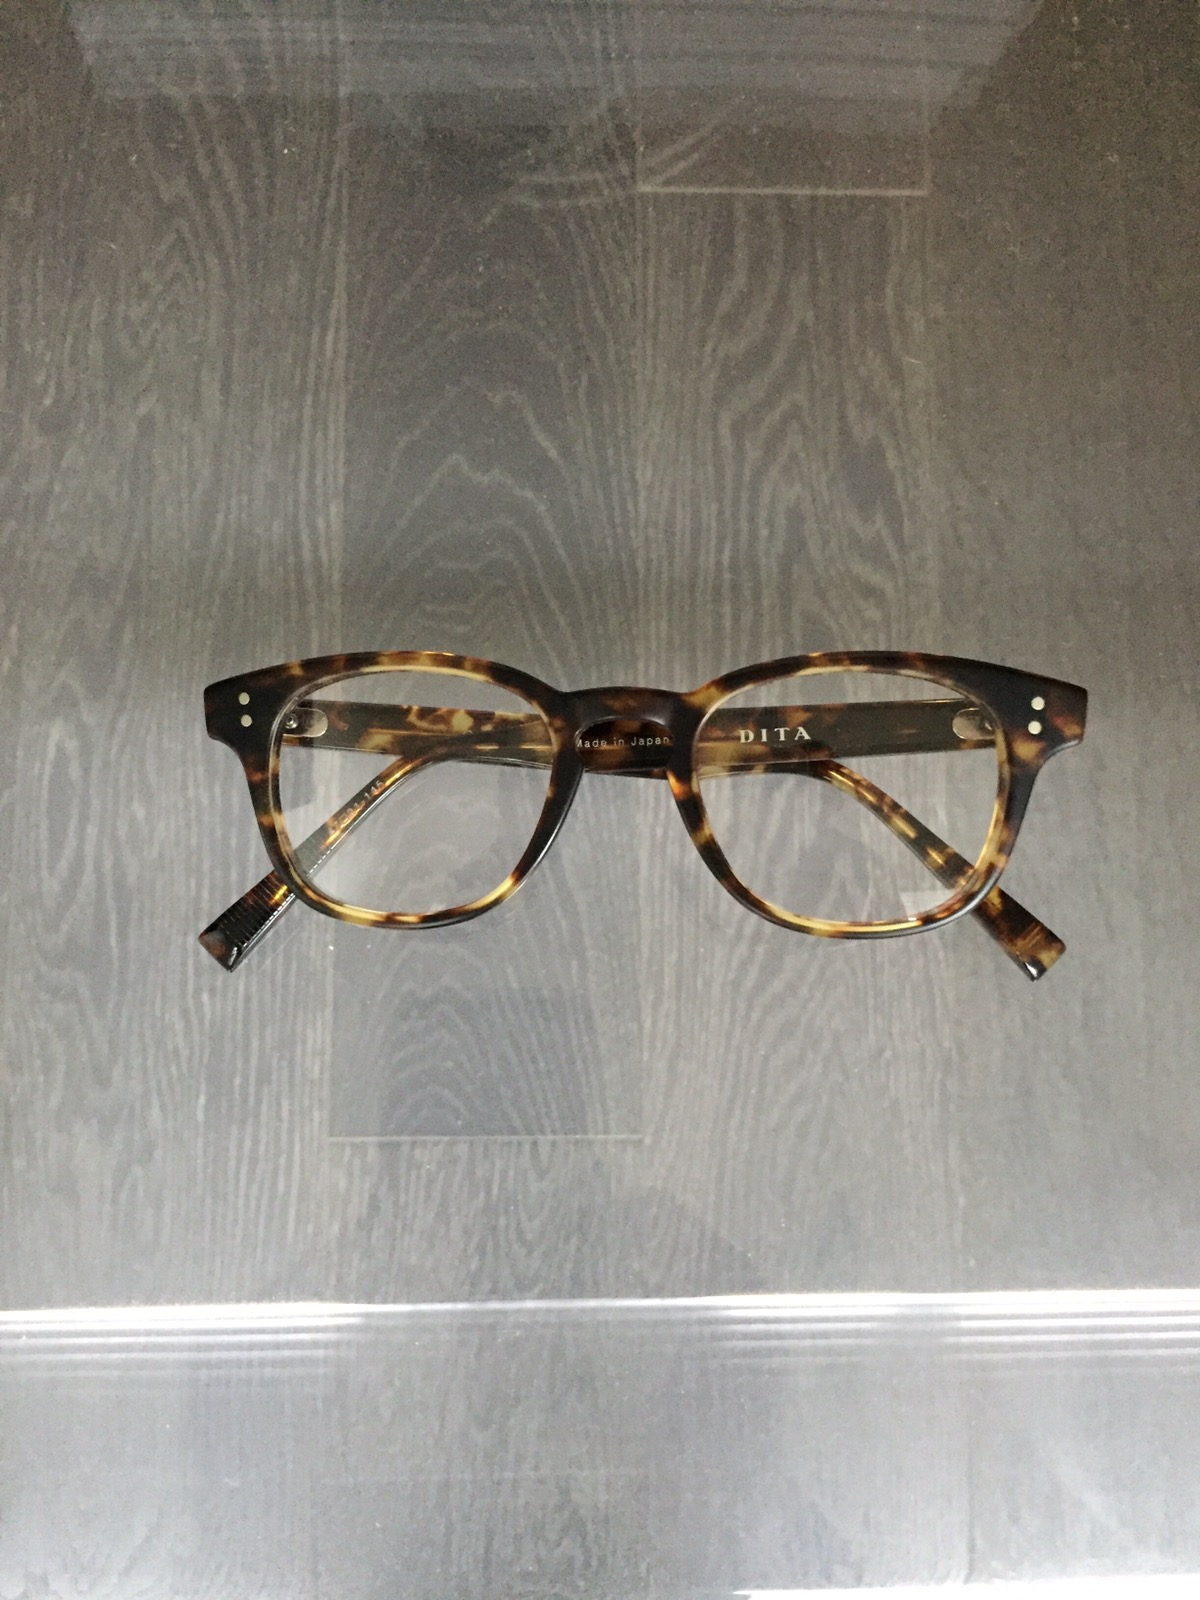 2b03381dab61 Dita New Outsider Frames Havana Made In Japan Last Drop